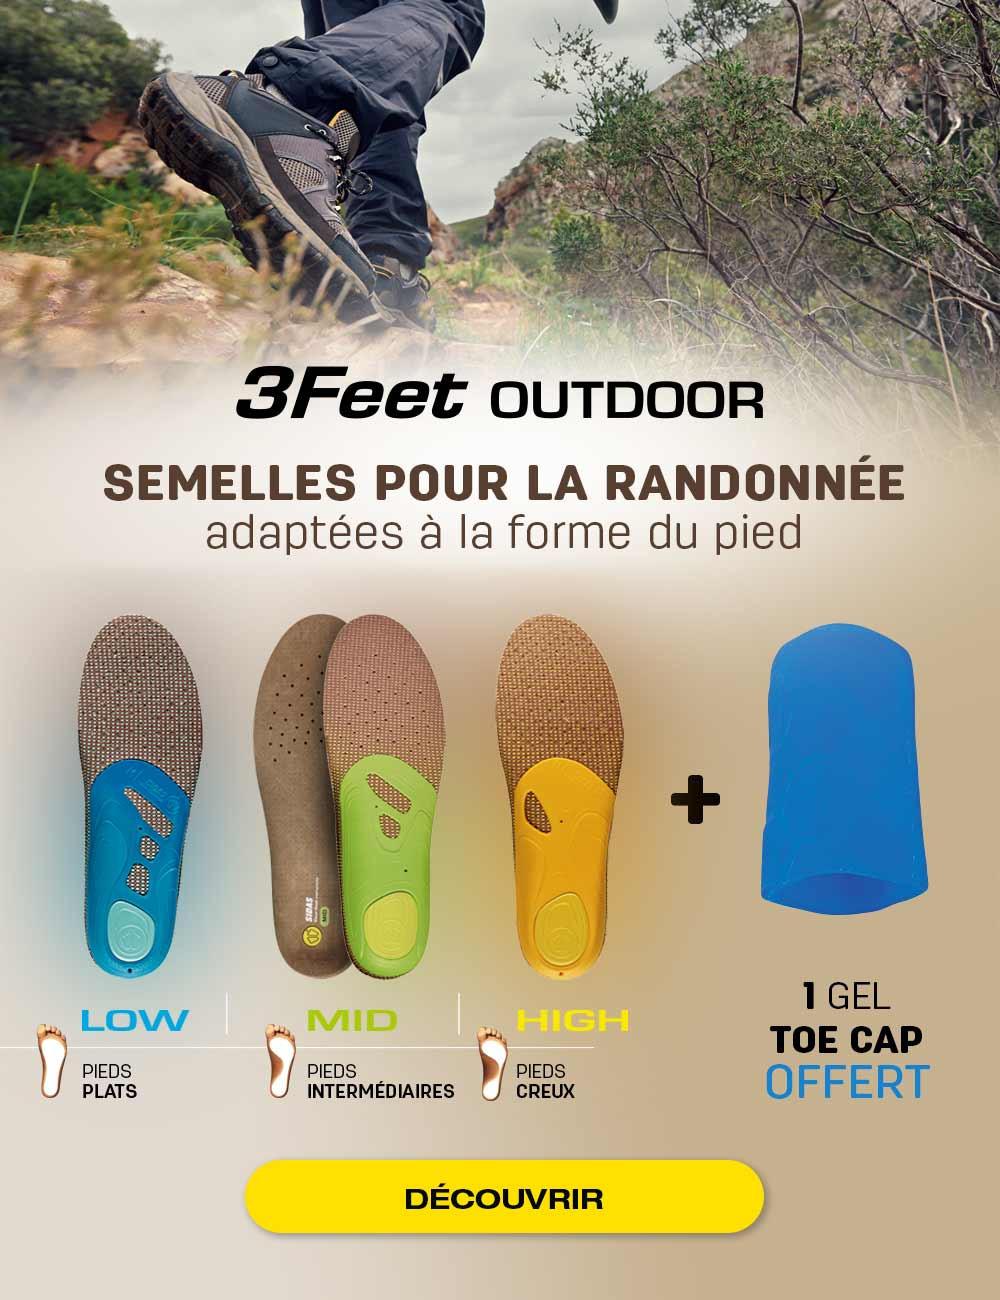 Achetez 1 paire de 3Feet Outdoor et recevez un gel toe cap GRATUITEMENT